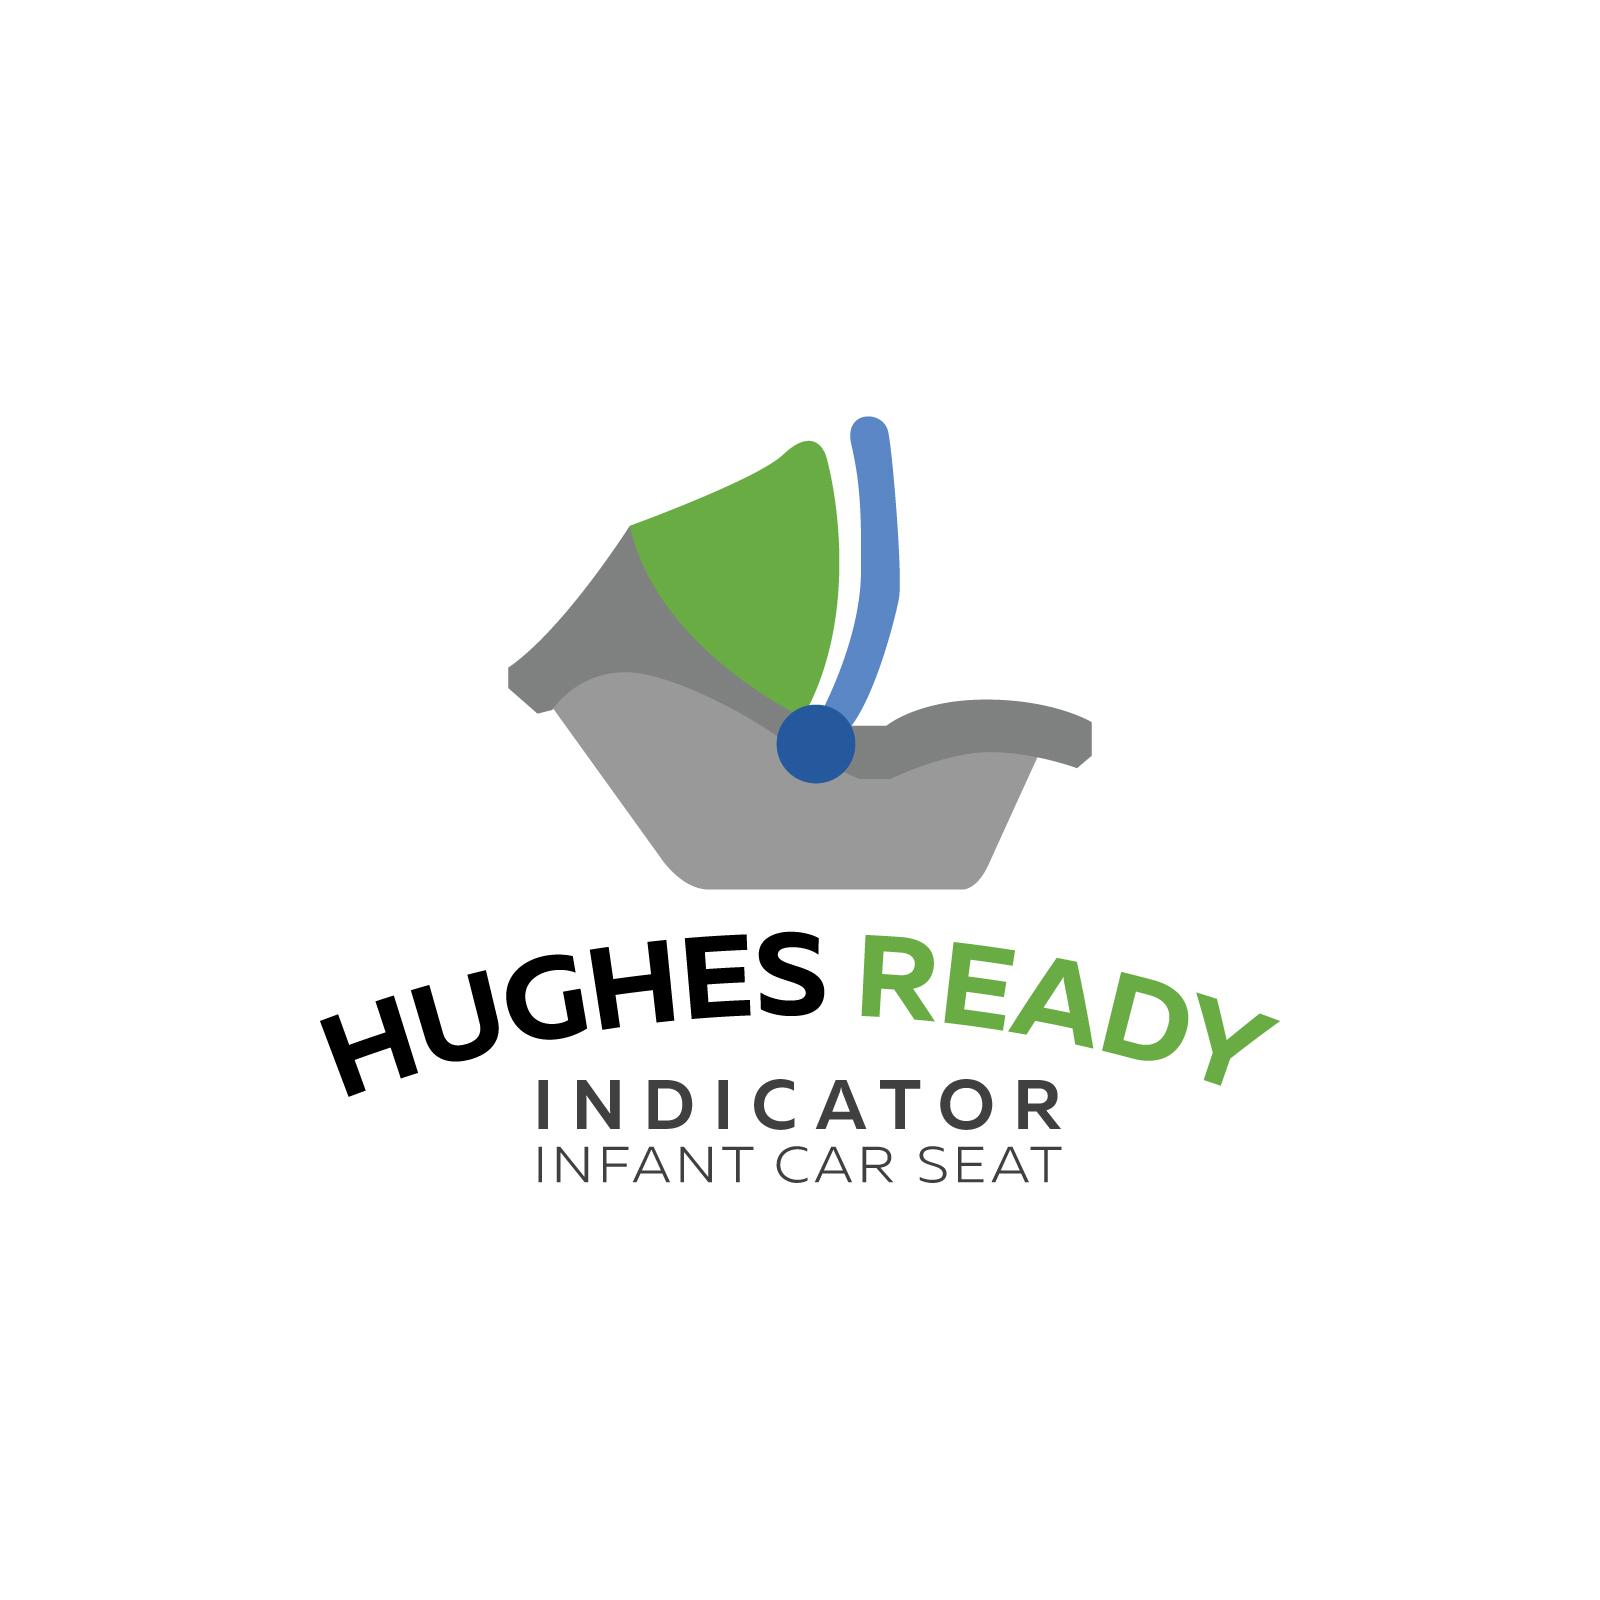 Hughes Ready Indicator Infant Car Seat